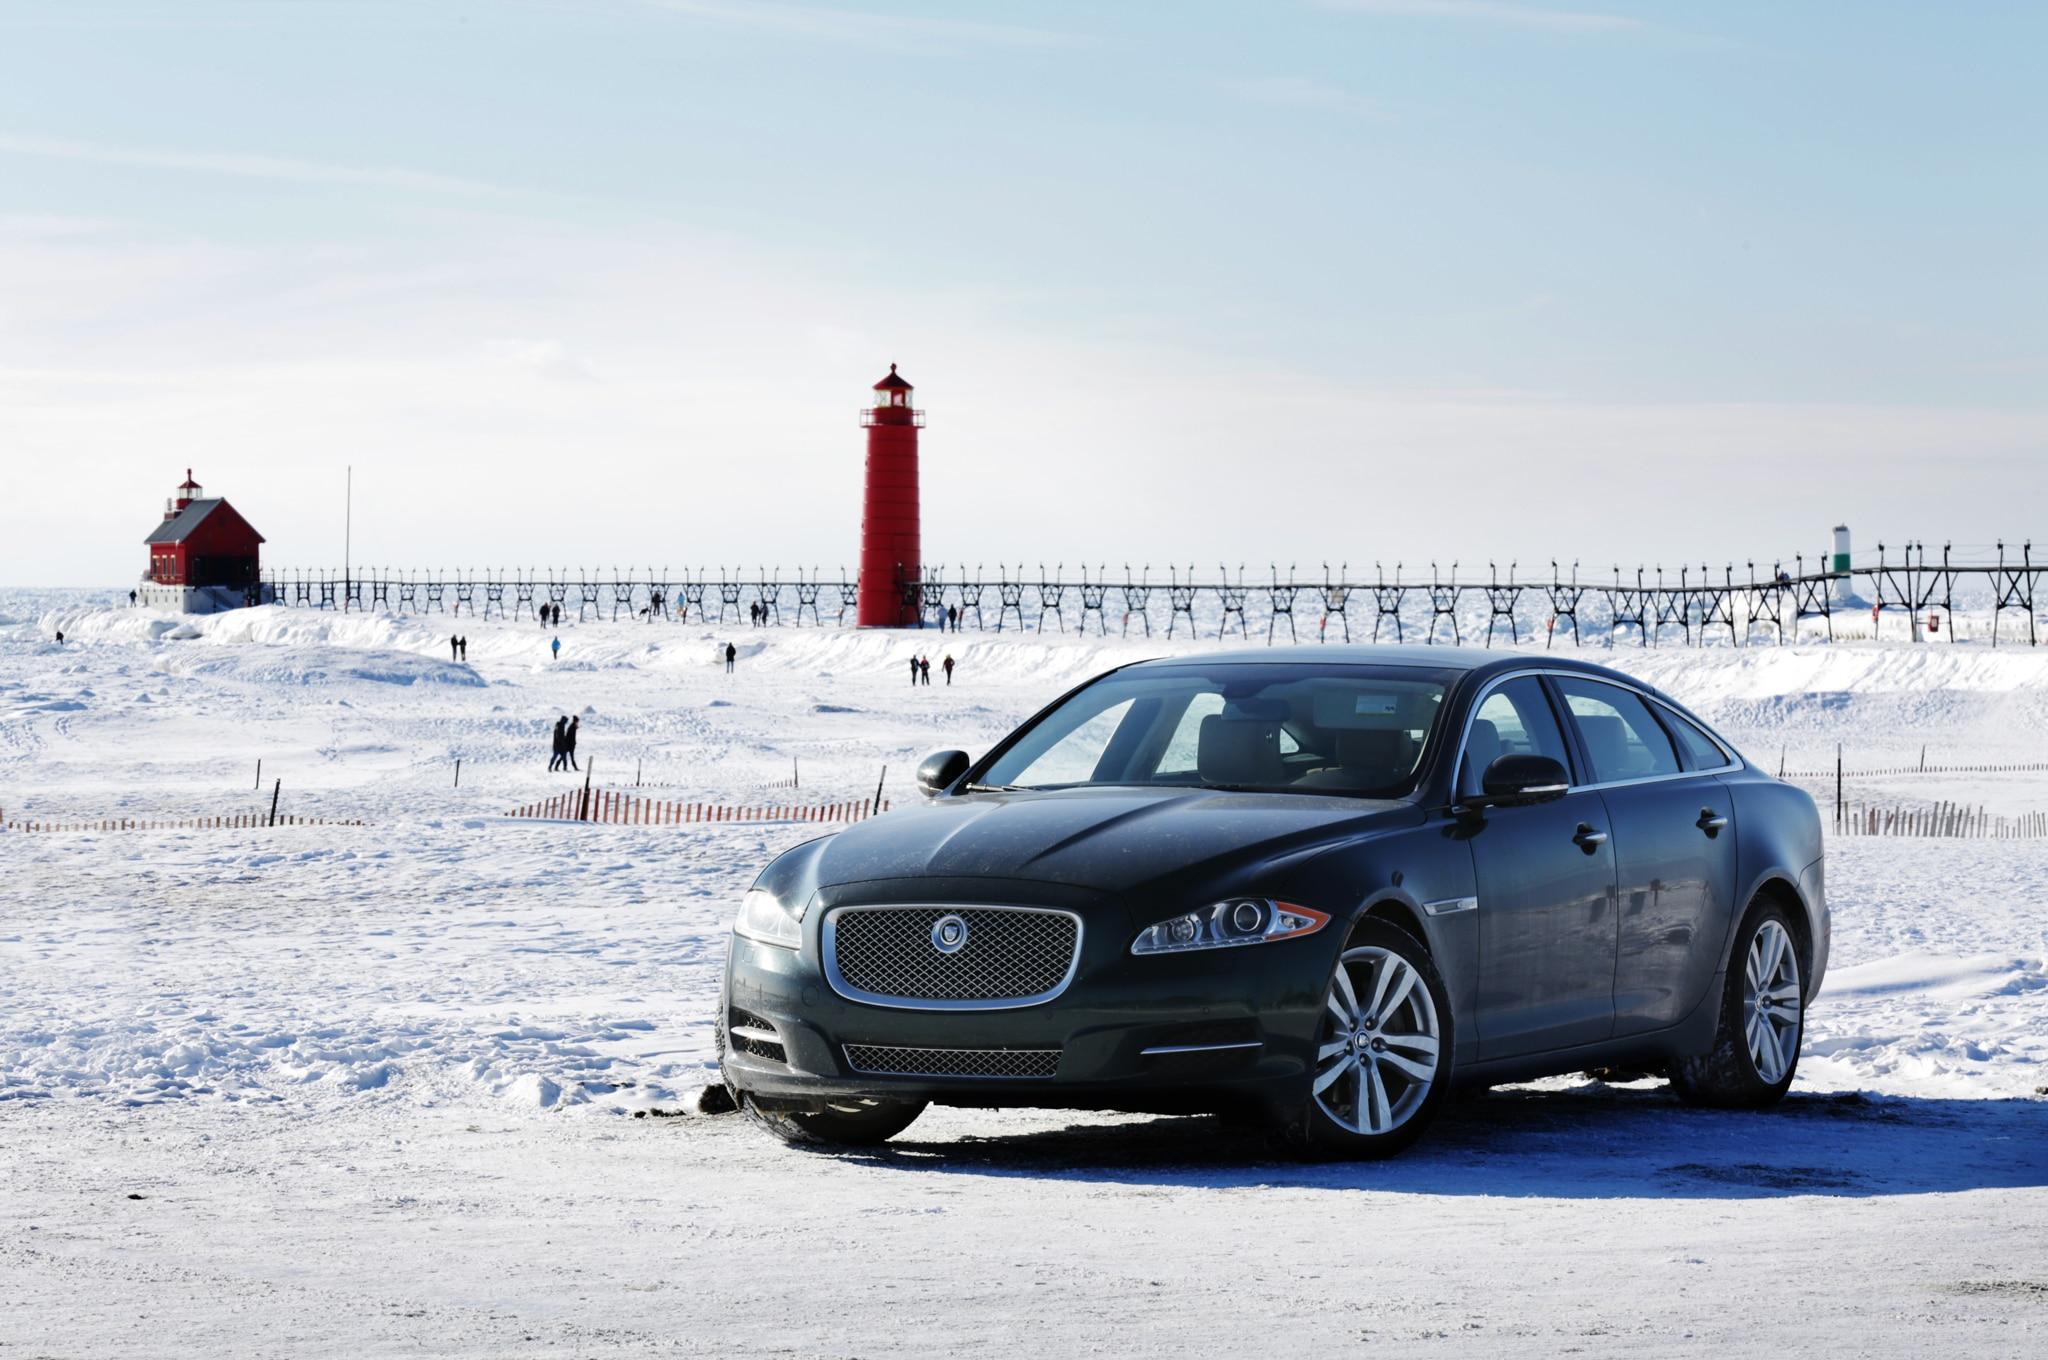 2013 Jaguar Xjl Front Grand Haven 021